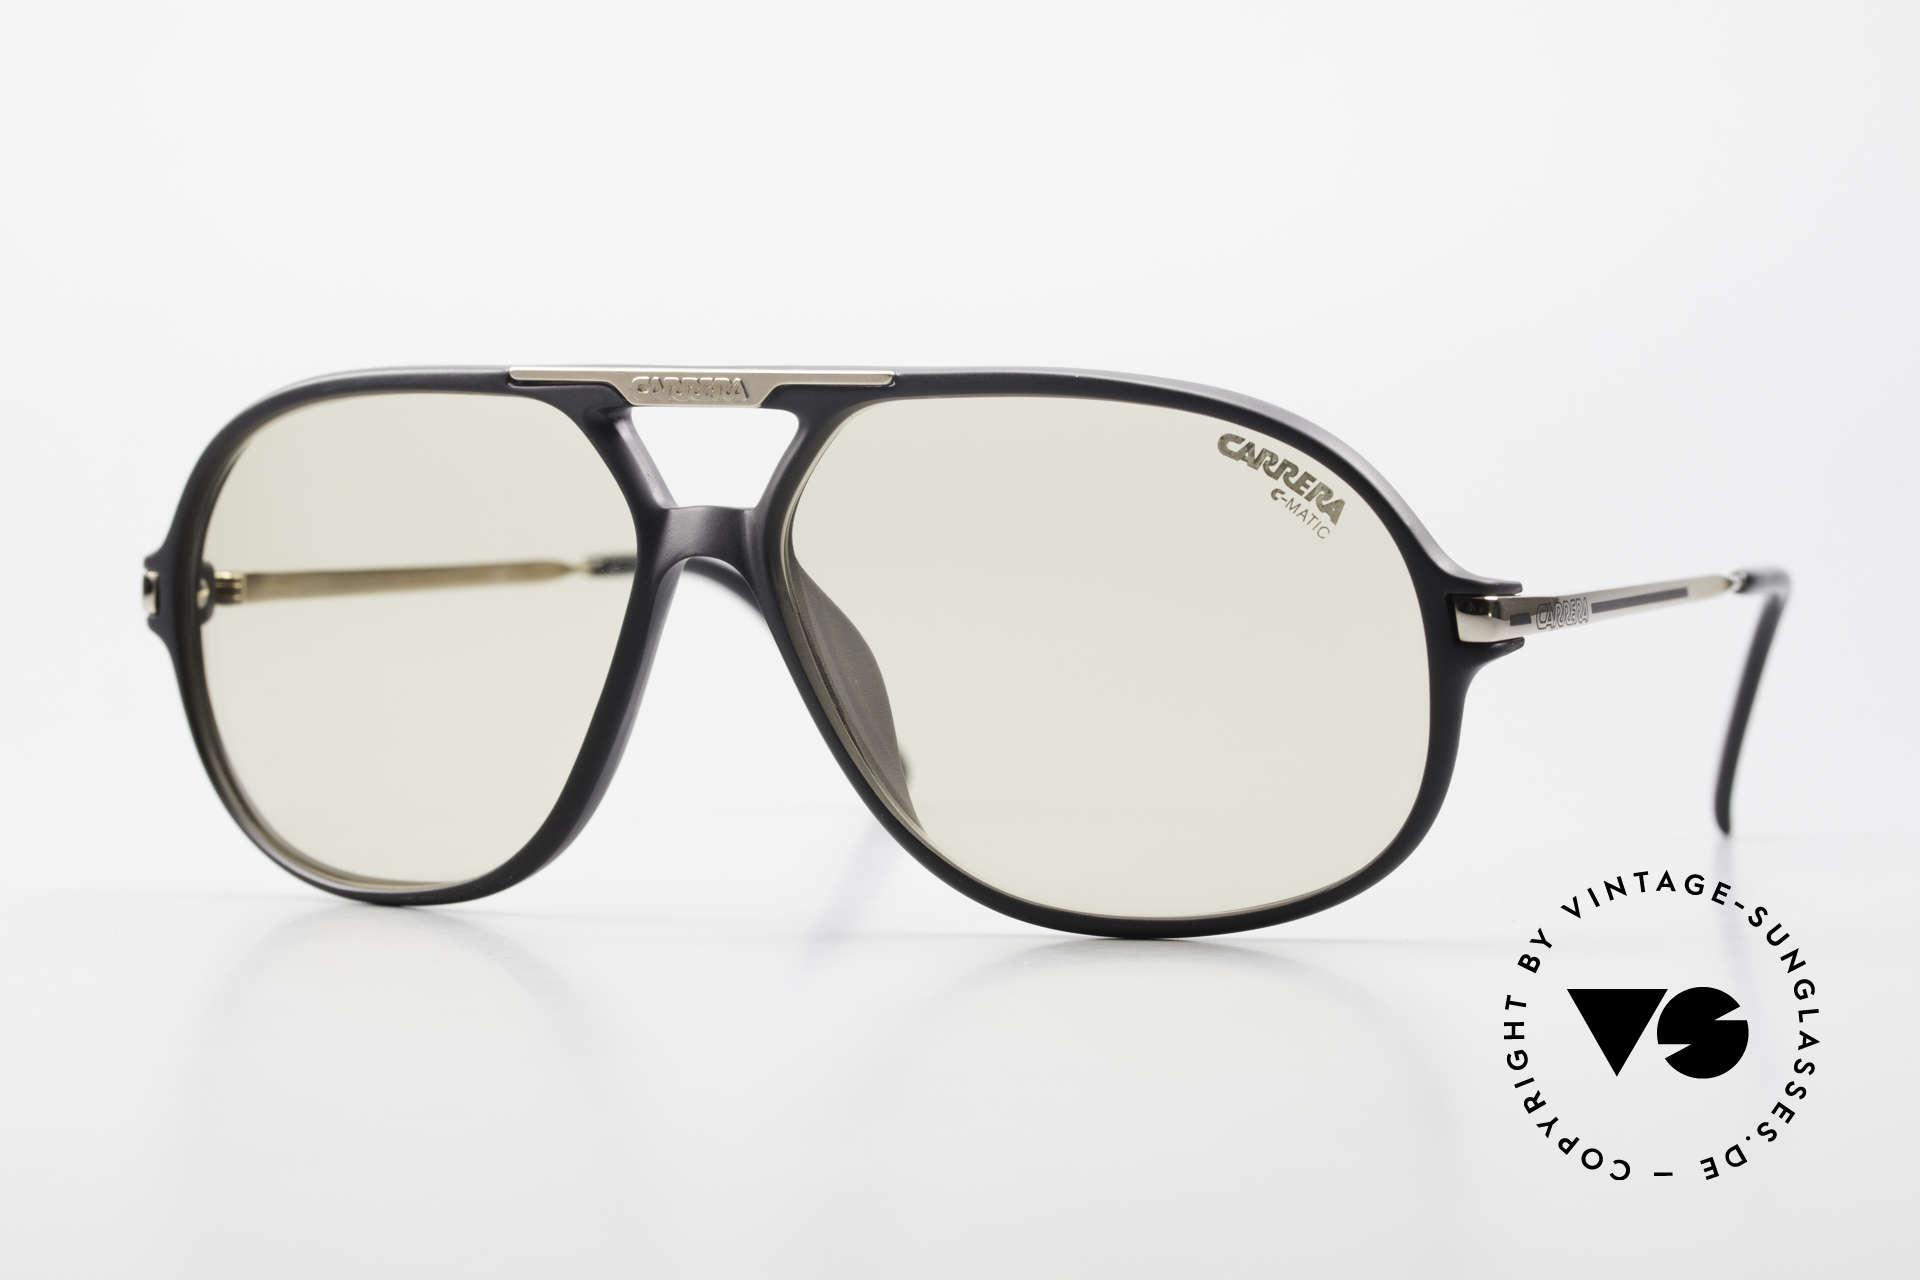 Carrera 5411 C-Matic With Extra Polarized Lenses, original Carrera 5411 'Ocean' sunglasses from 1989, Made for Men